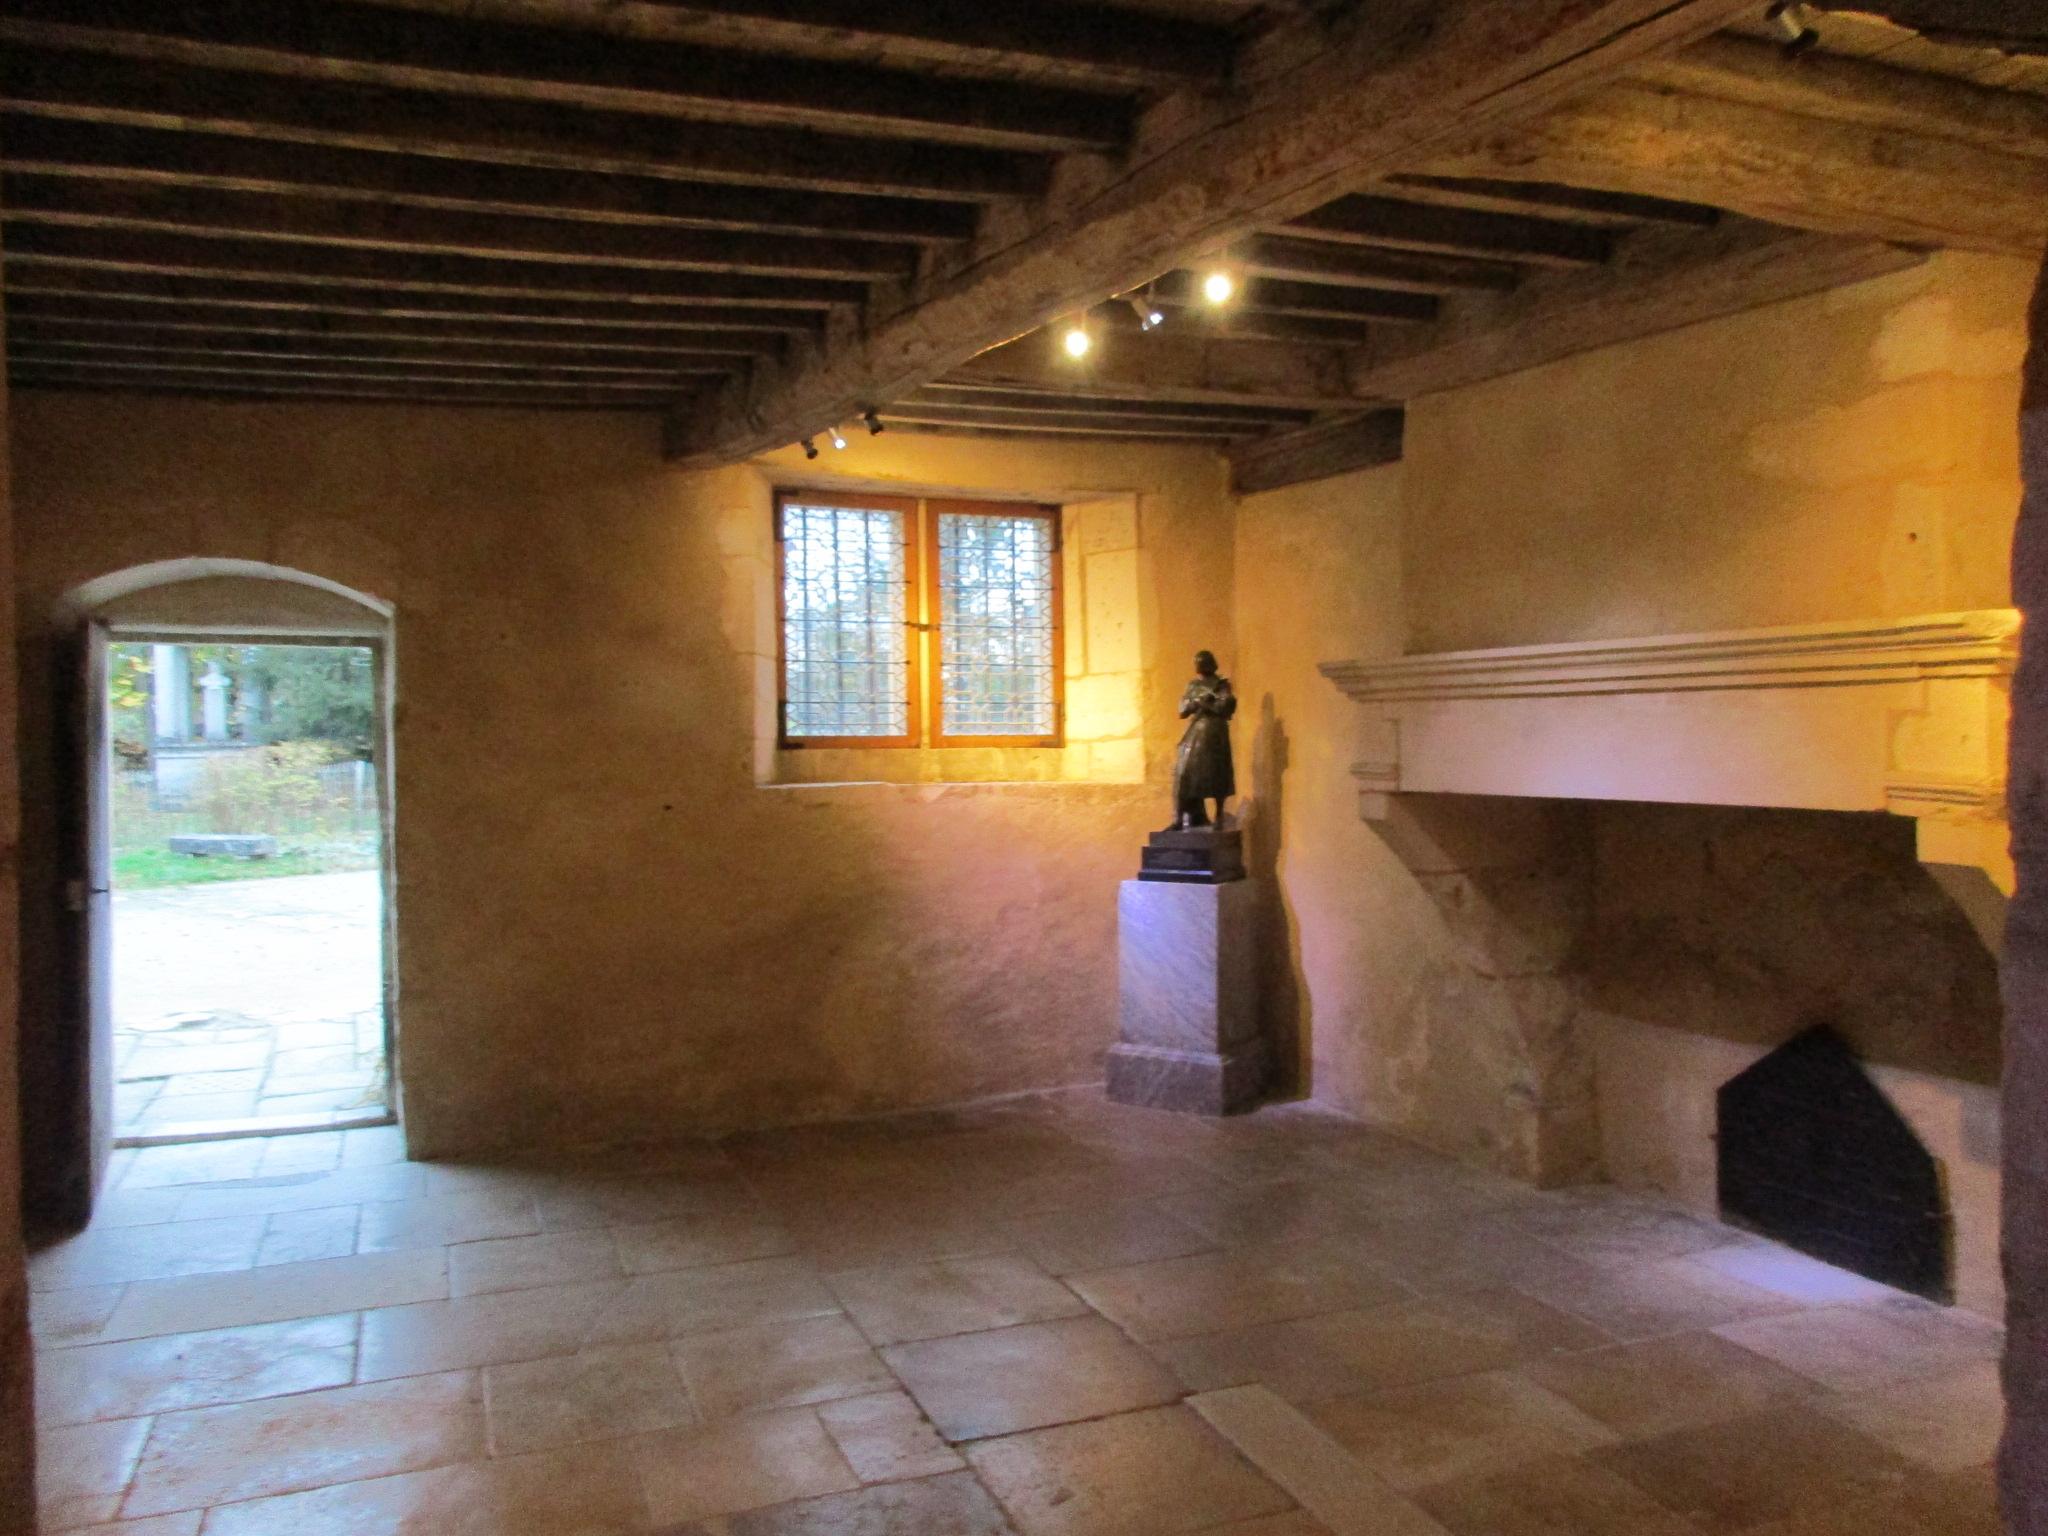 File:Maison natale Jeanne d'Arc 042 jpg - Wikimedia Commons